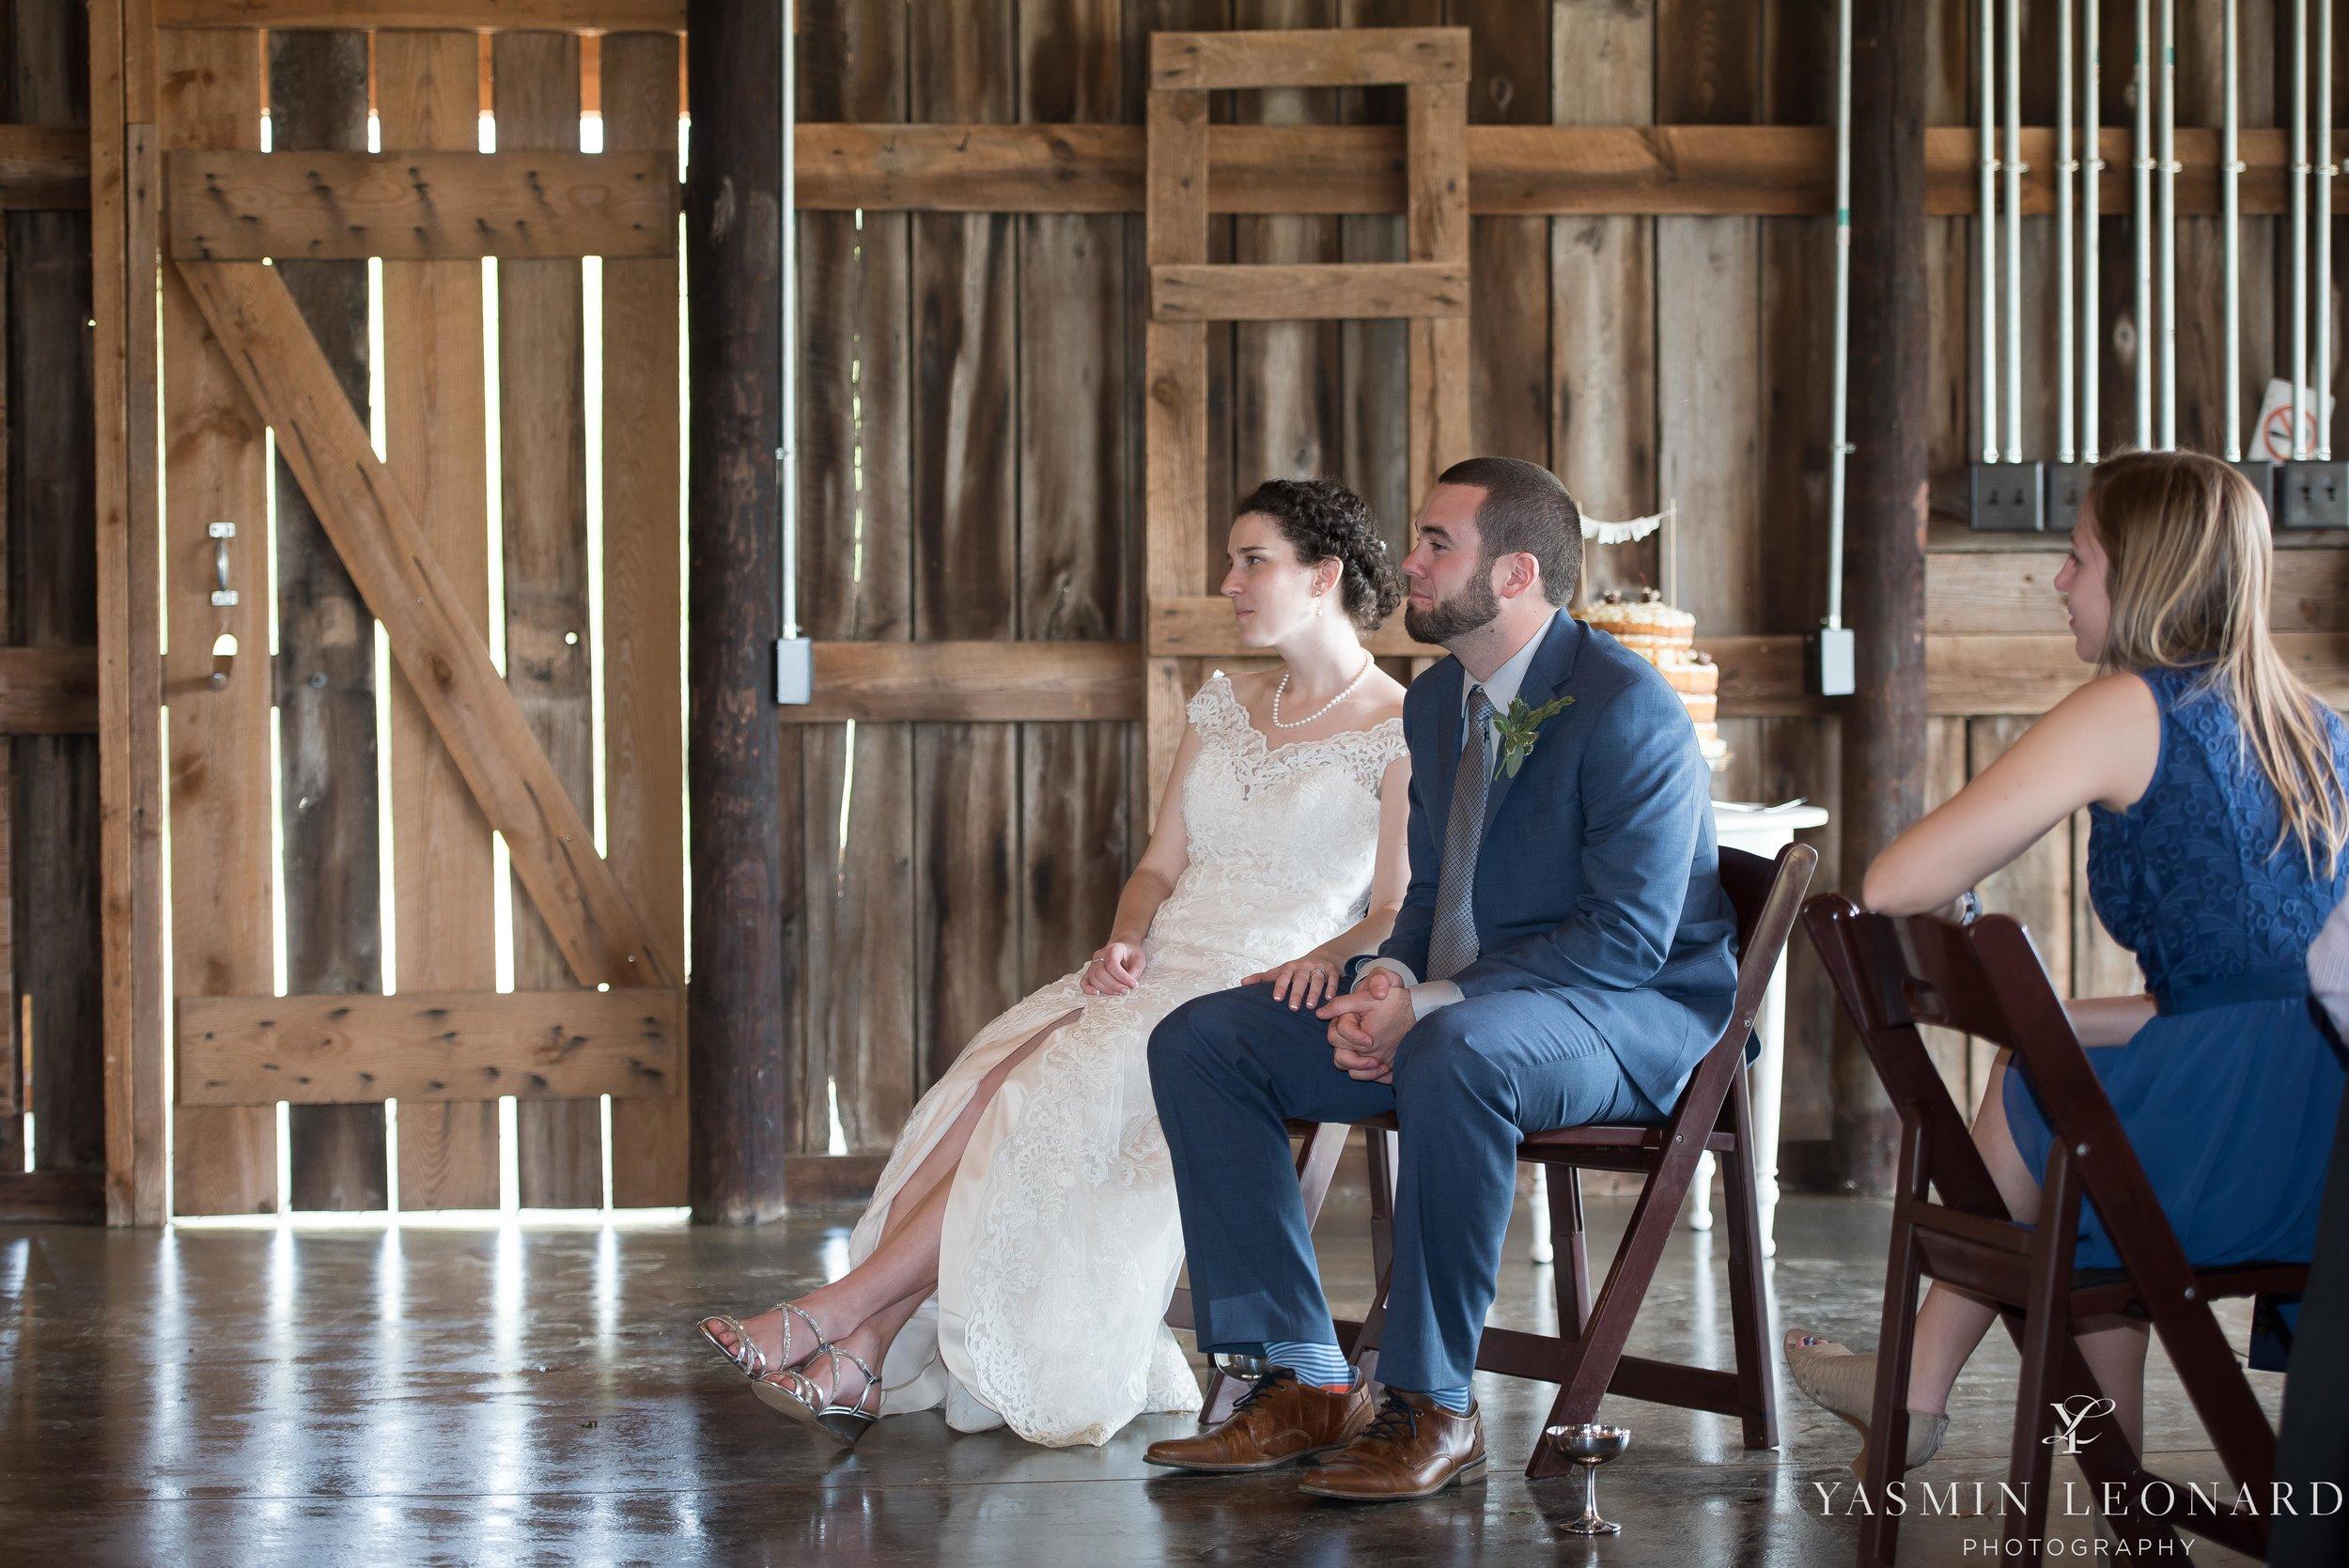 Courtney and Justin - L'abri at Linwood - Yasmin Leonard Photography-64.jpg